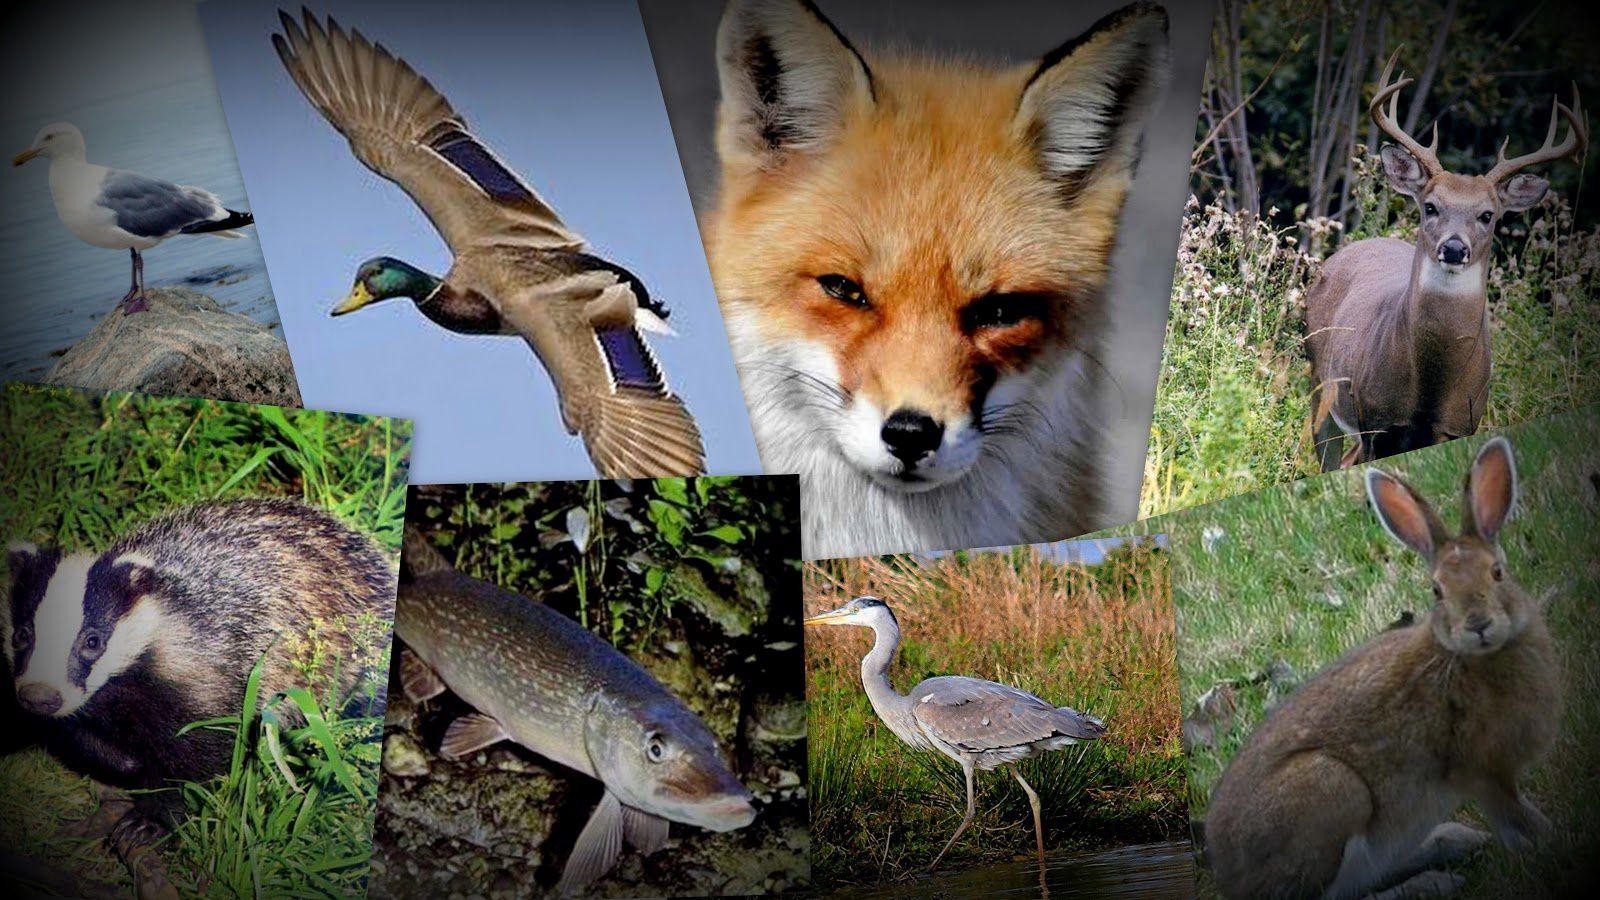 la Faune - Source roxanneetmaudeitalie.blogspot.com